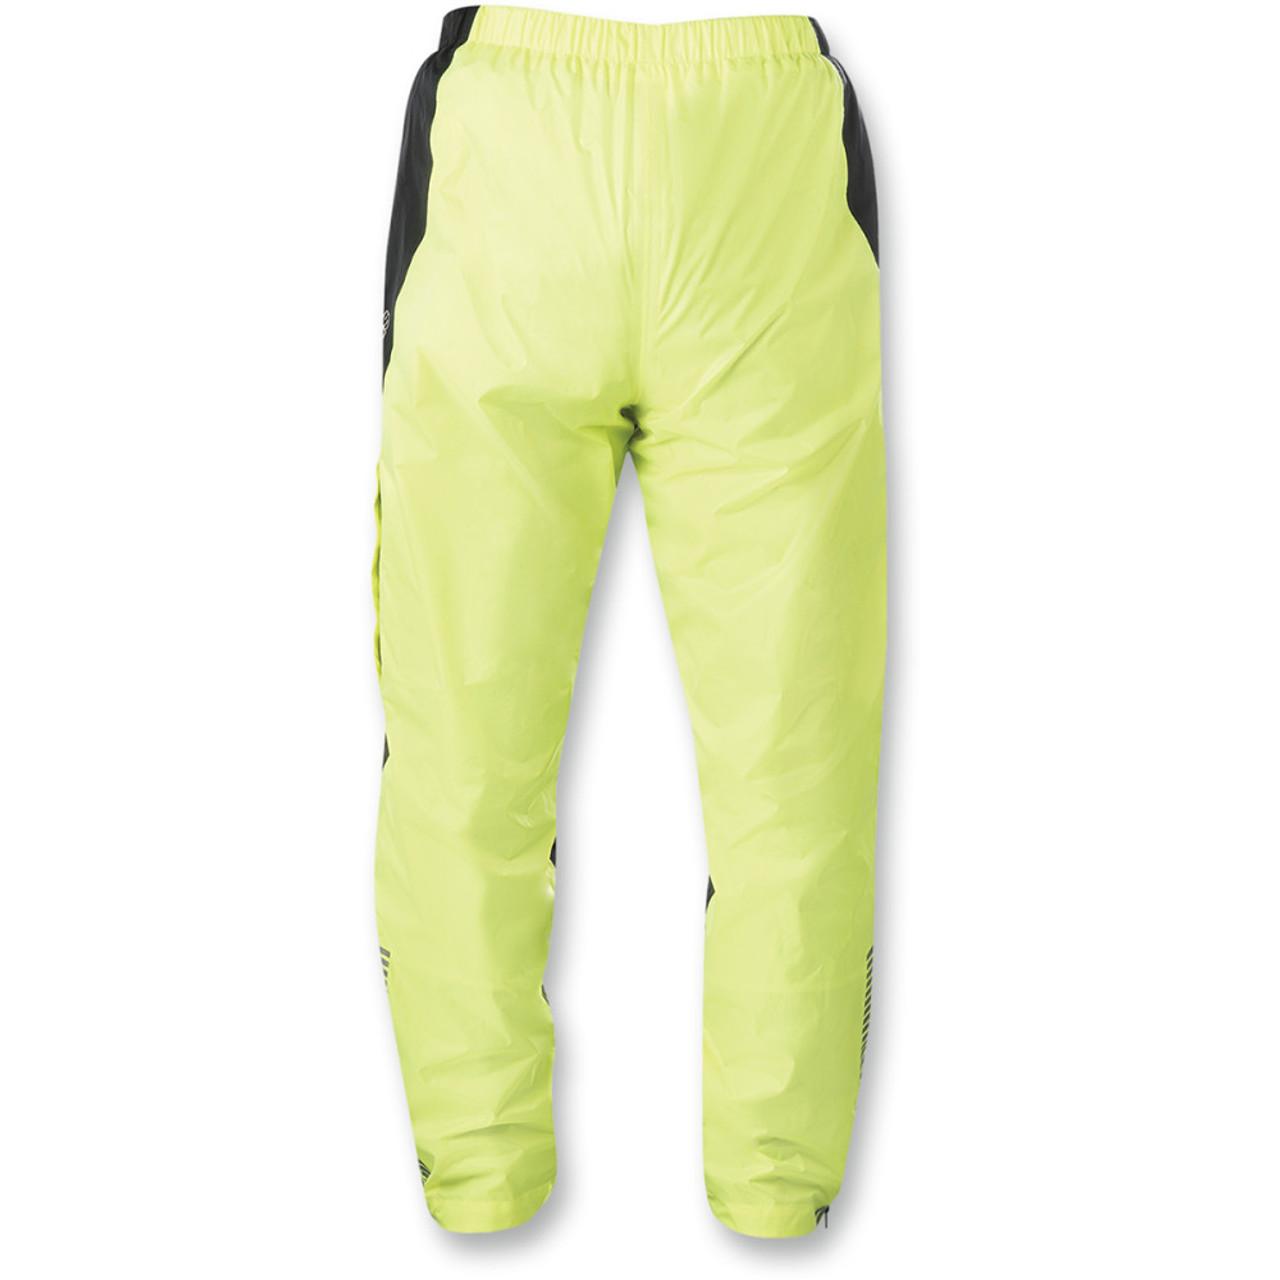 f7467326f52 Alpinestars Hurricane Motorcycle Rain Pants - Fluorescent Yellow/Black -  Get Lowered Cycles